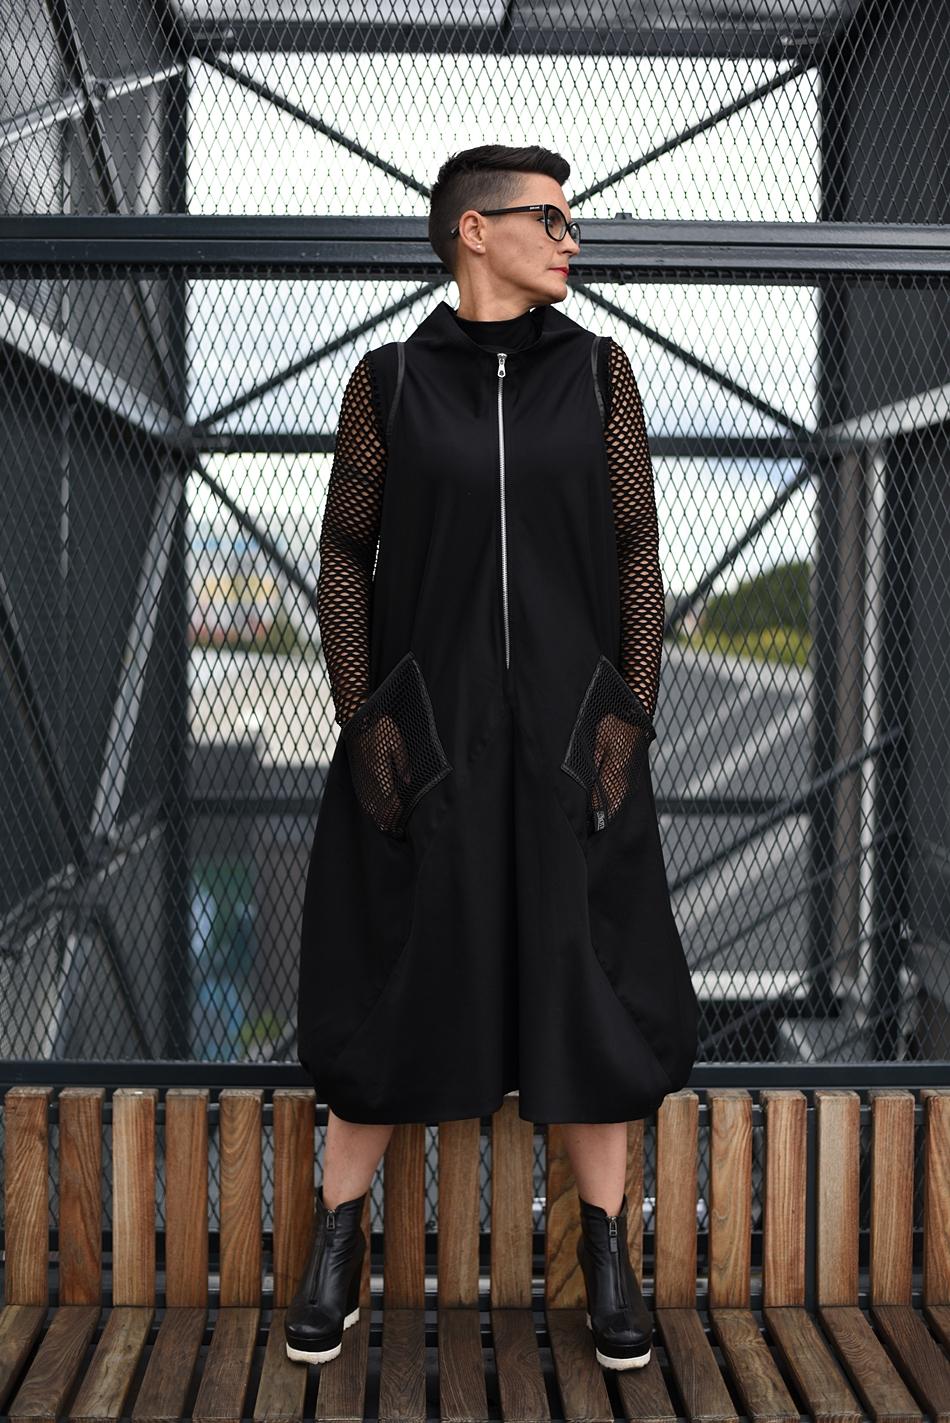 Broth_design_clothes_080